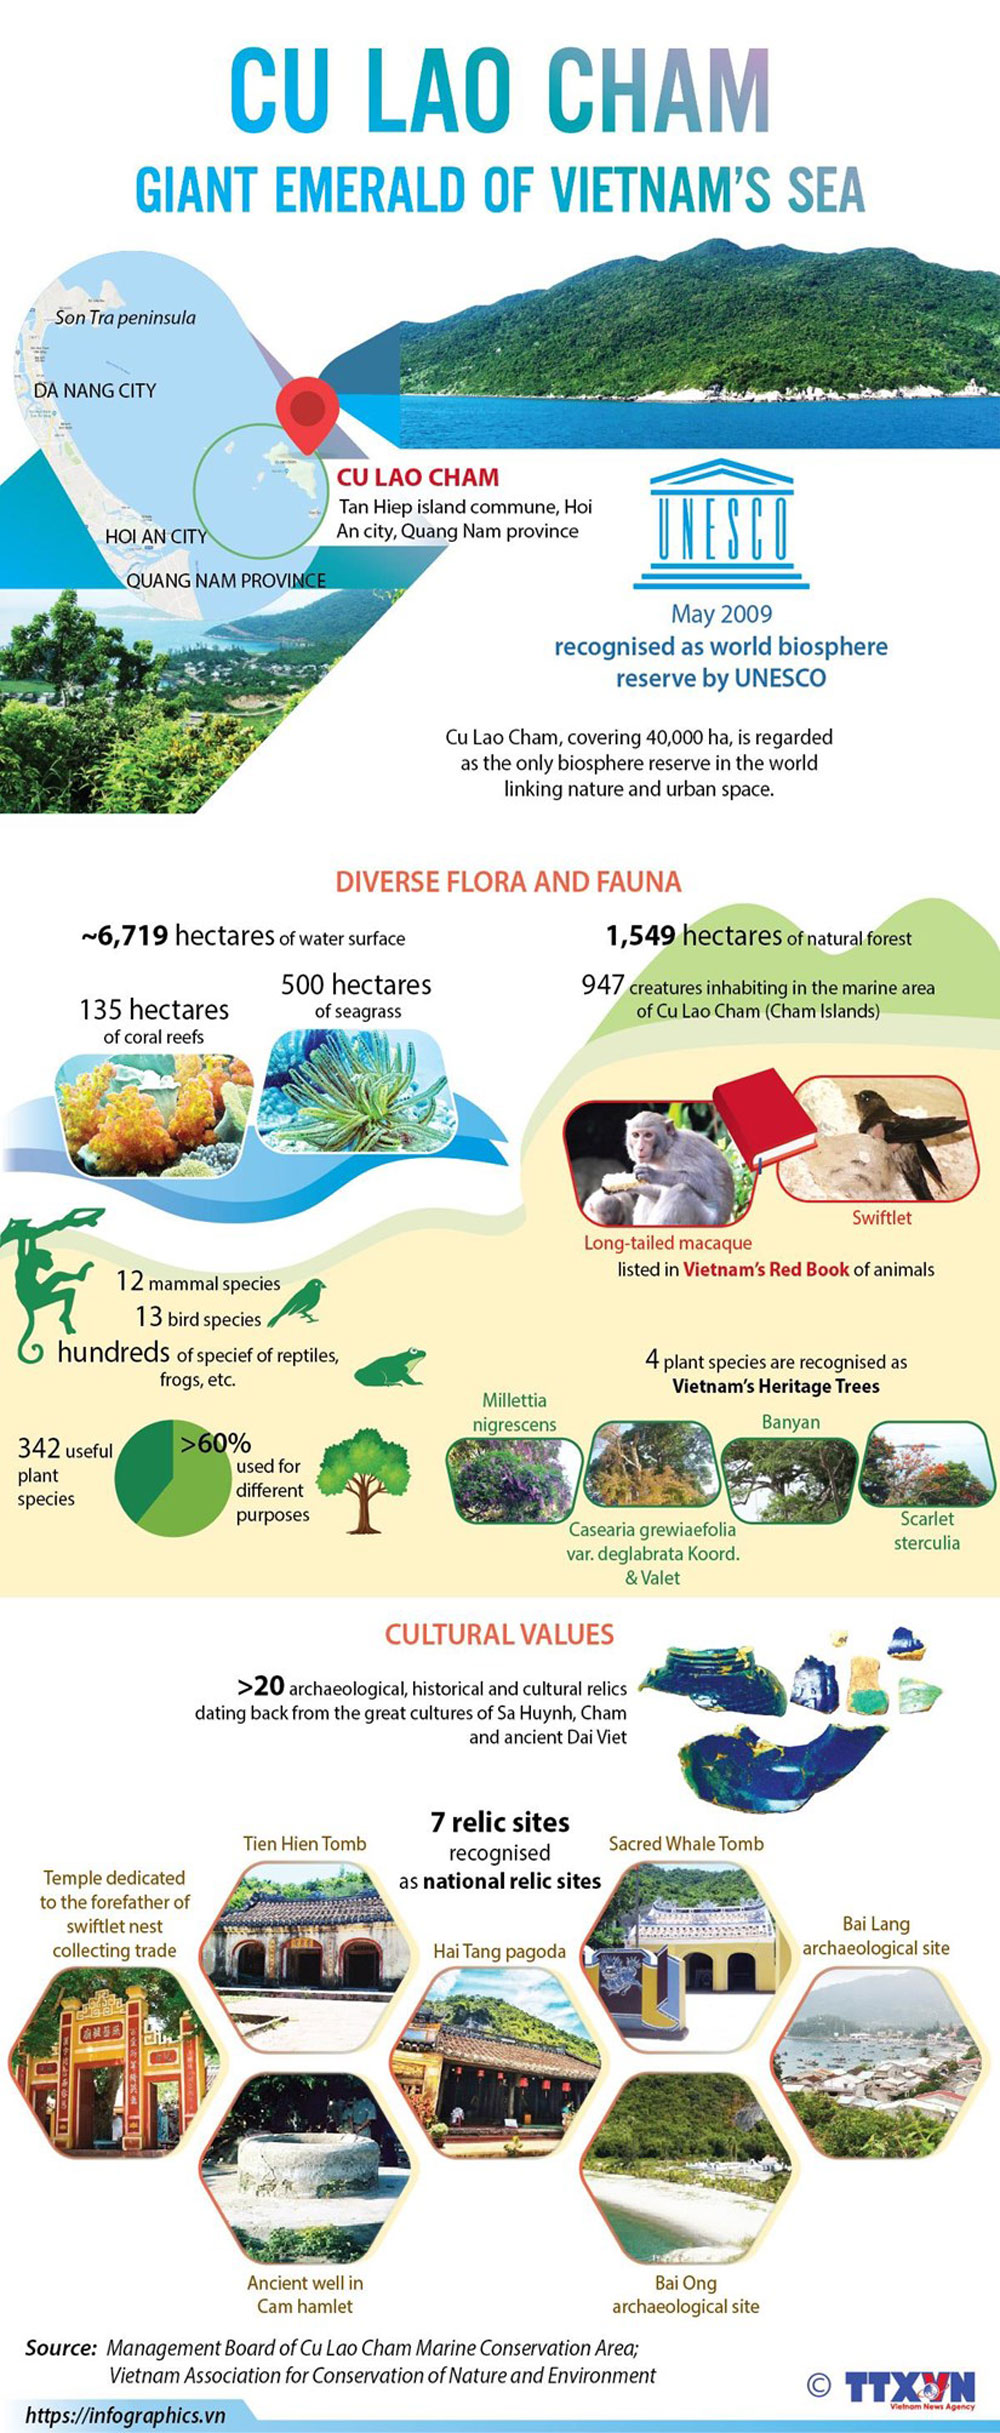 Cu Lao Cham, Giant emerald, Vietnam's sea, cultural identities, popular destination